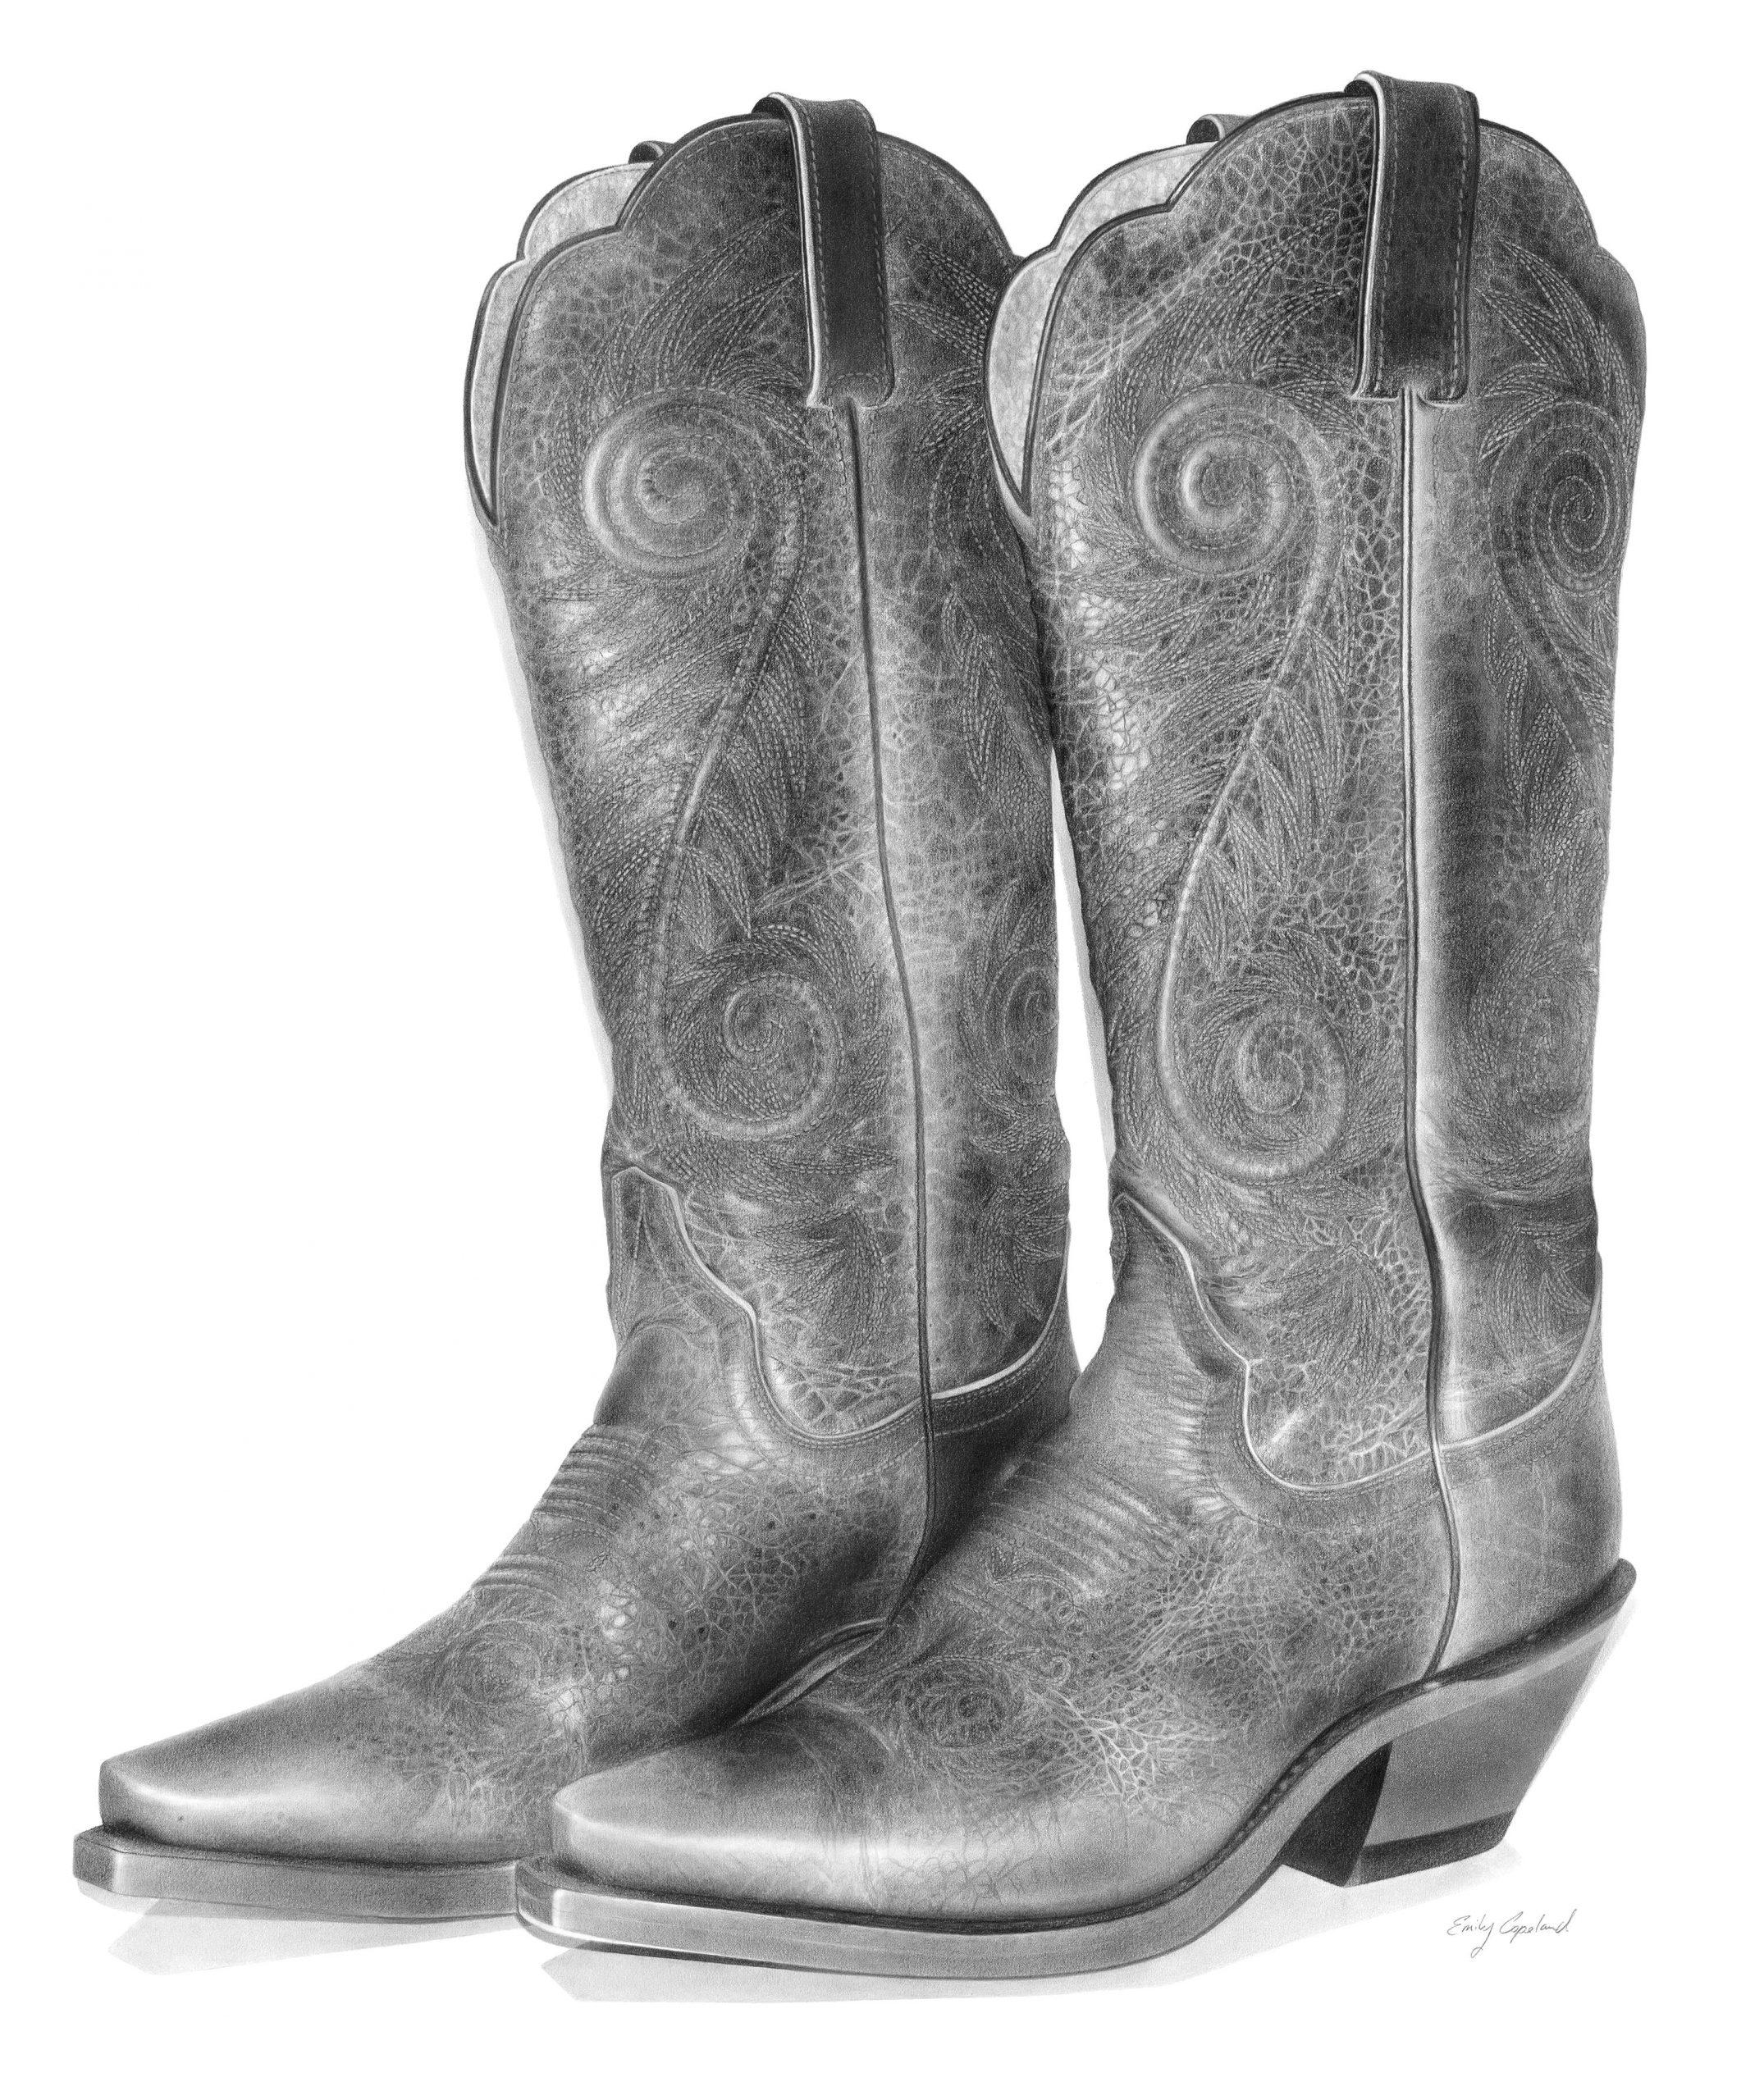 Vintage Cowboy Boots – Emily Copeland